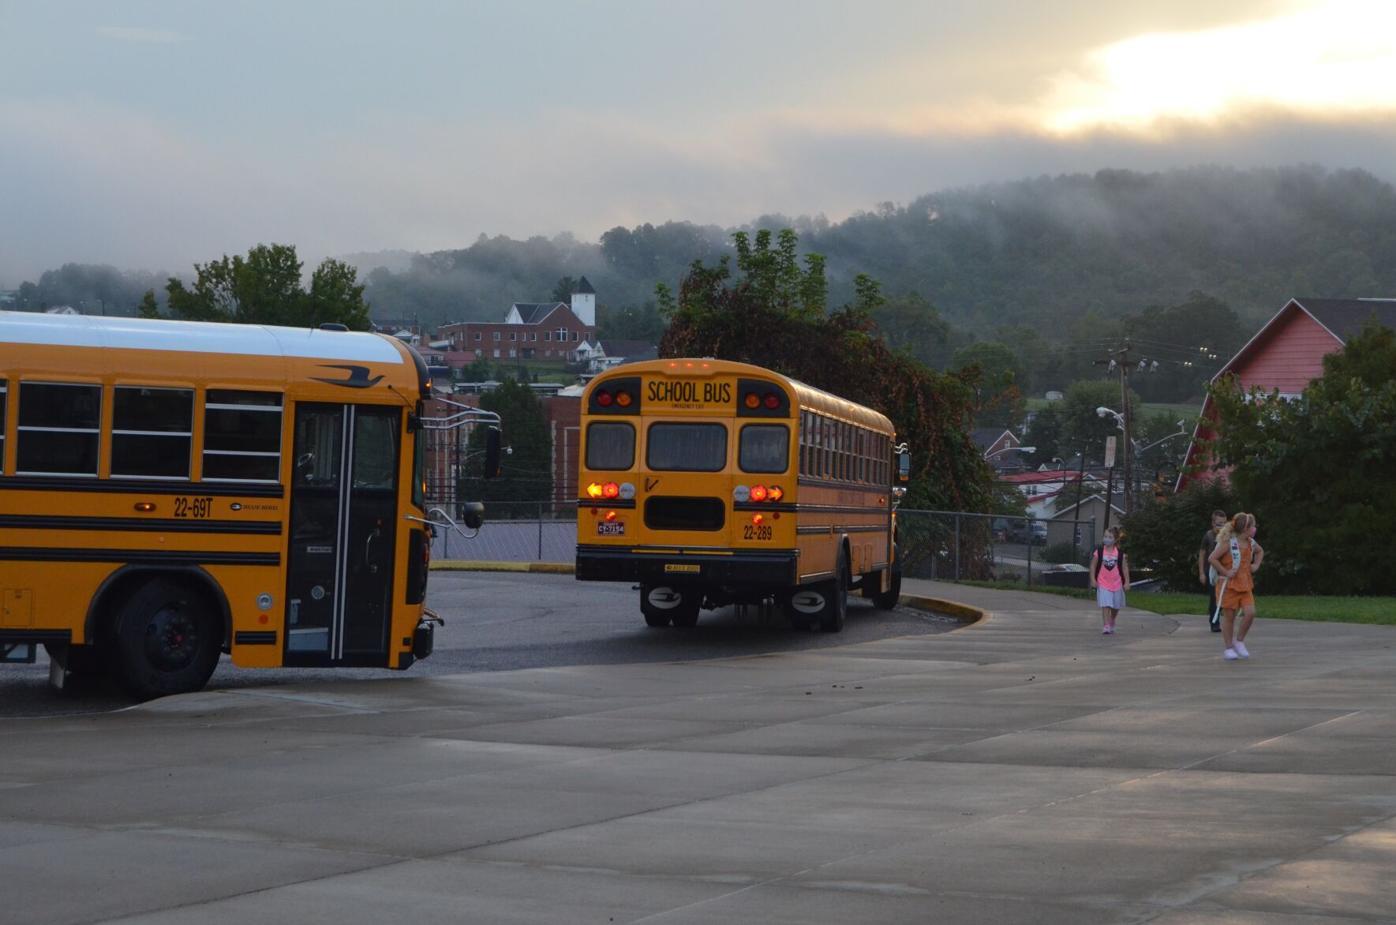 Buses at Nutter Fort